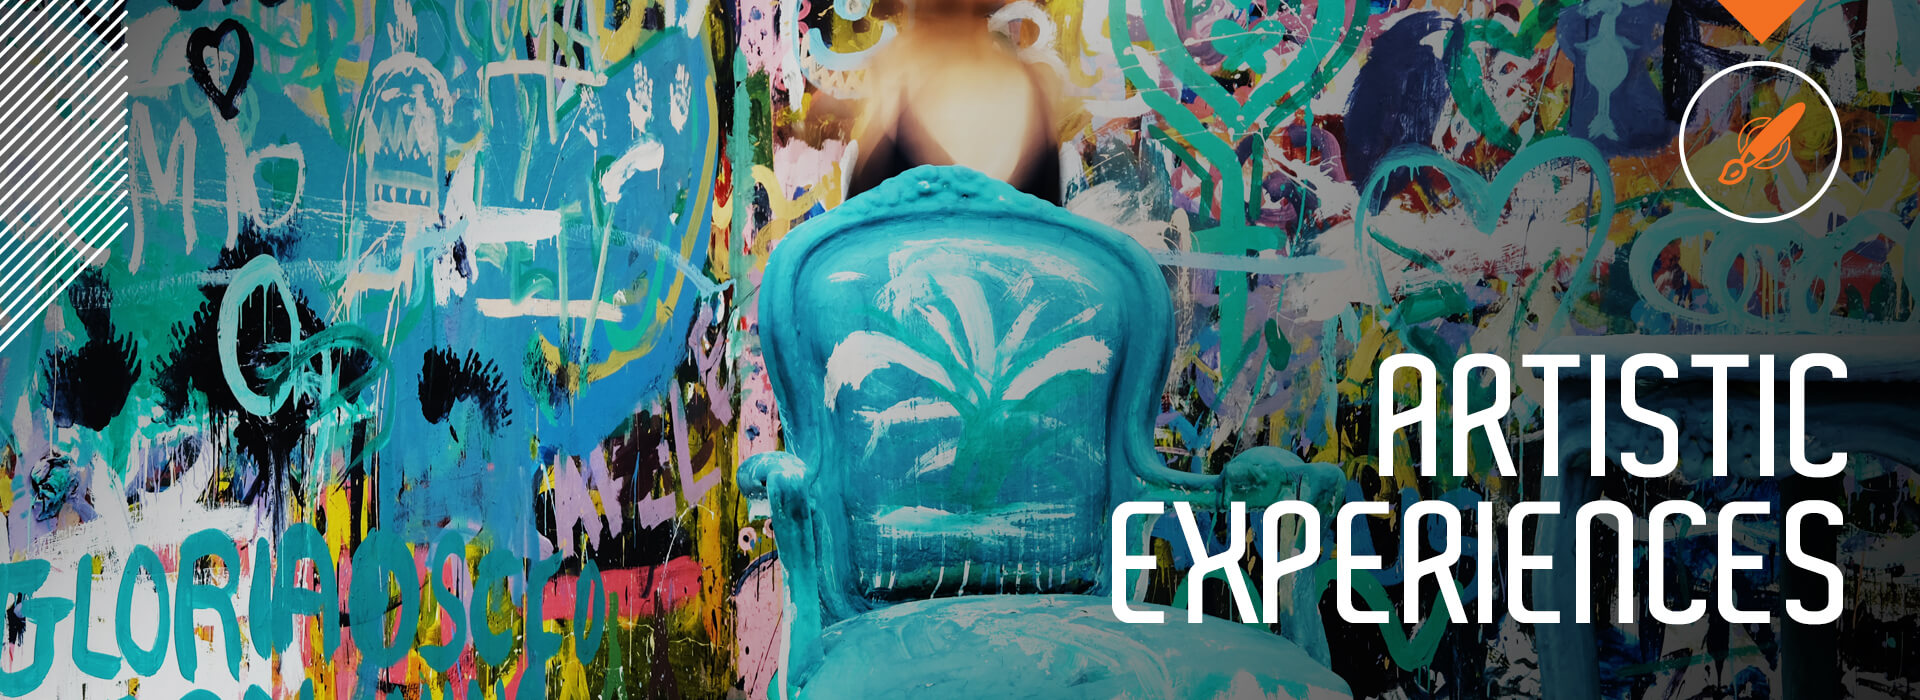 Artistic Experiences